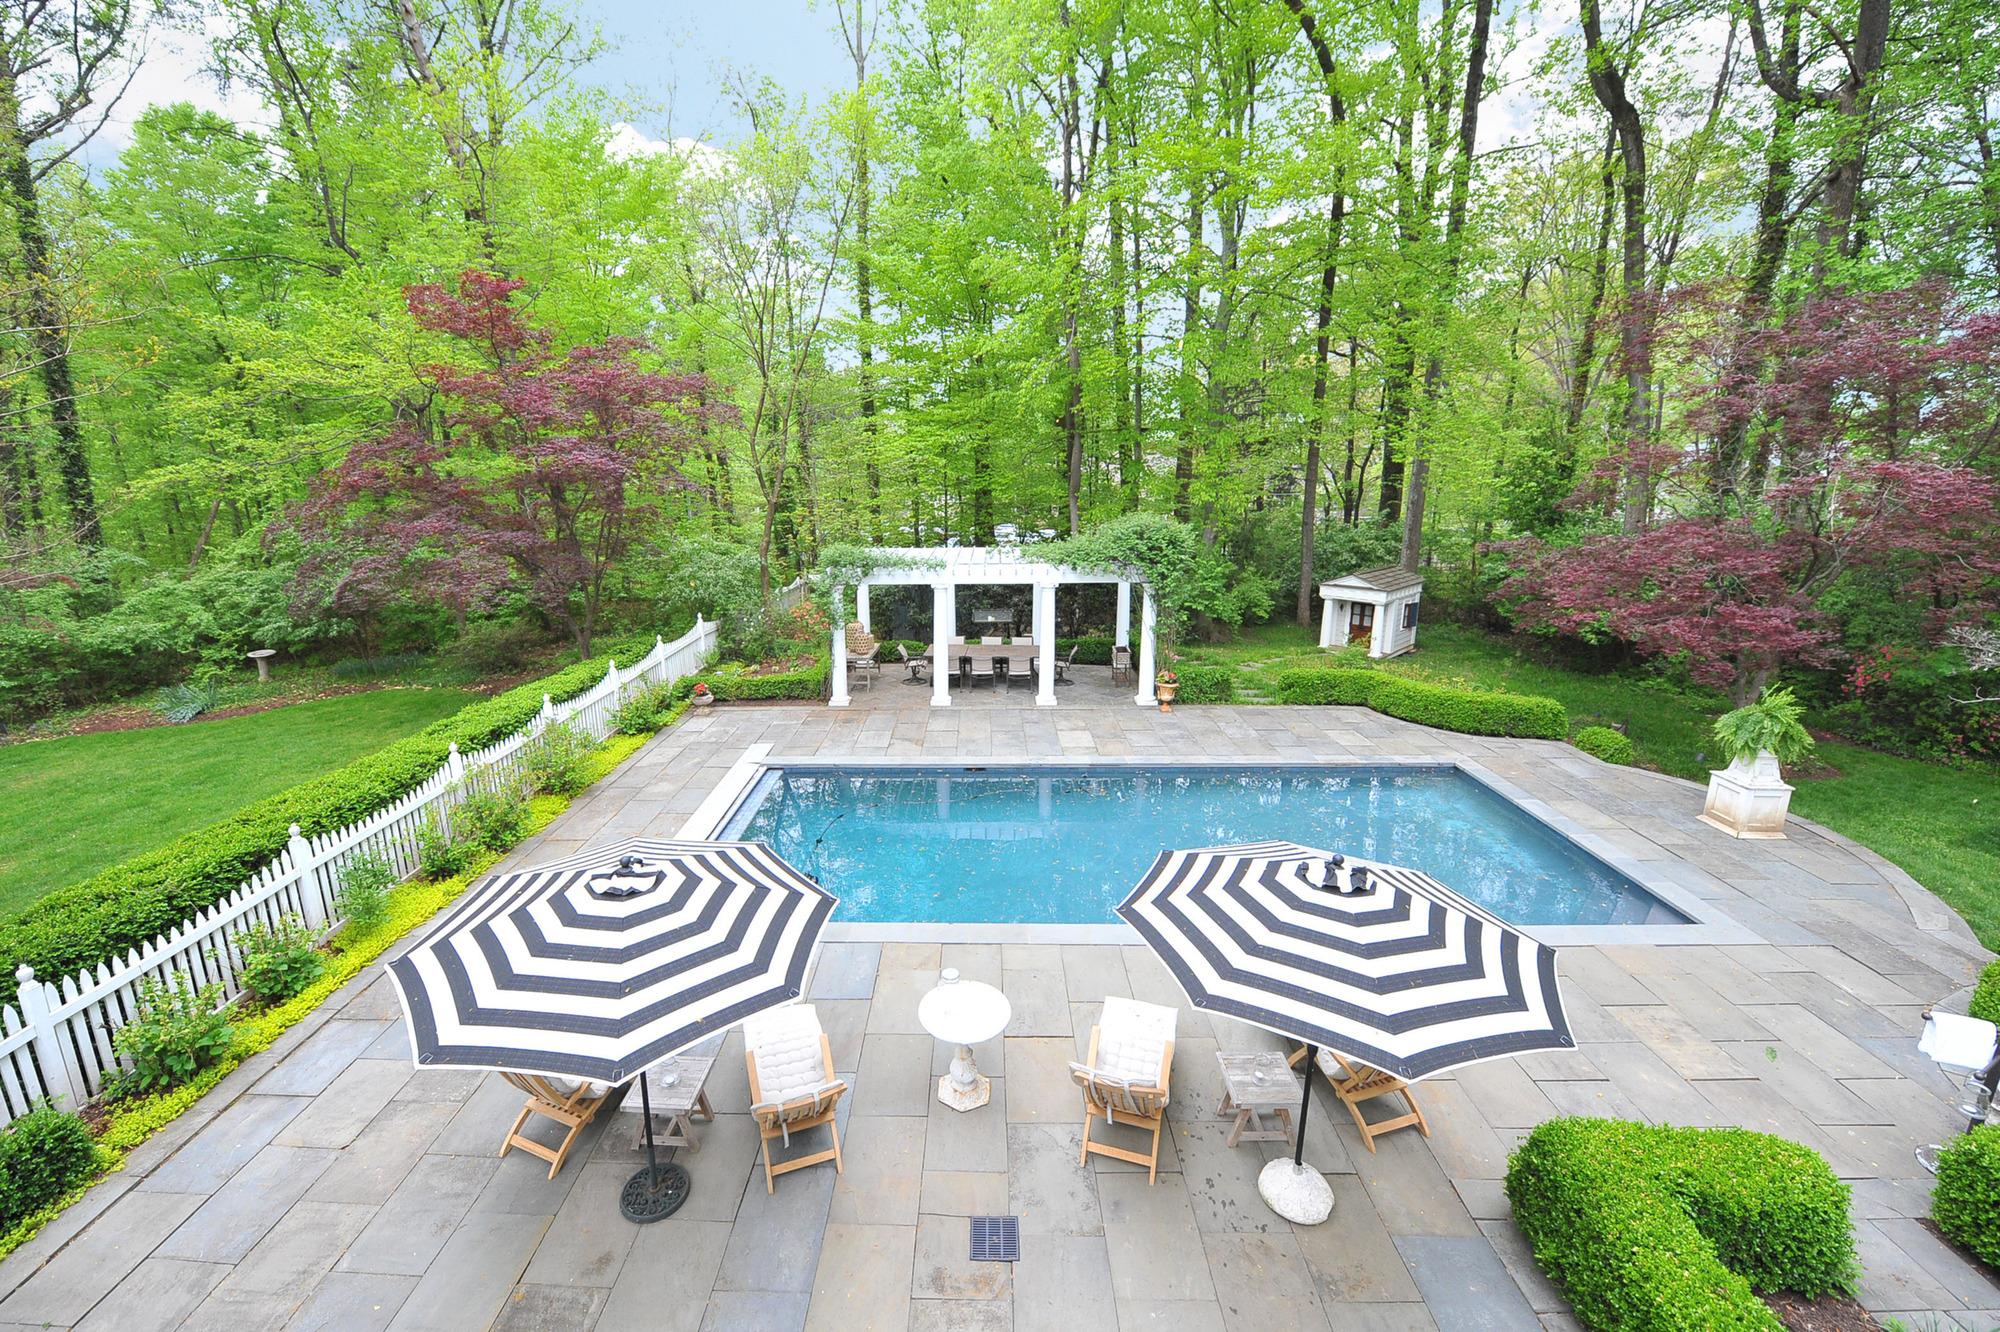 Bradley _ Pergola & Pool & Dog House.jpg